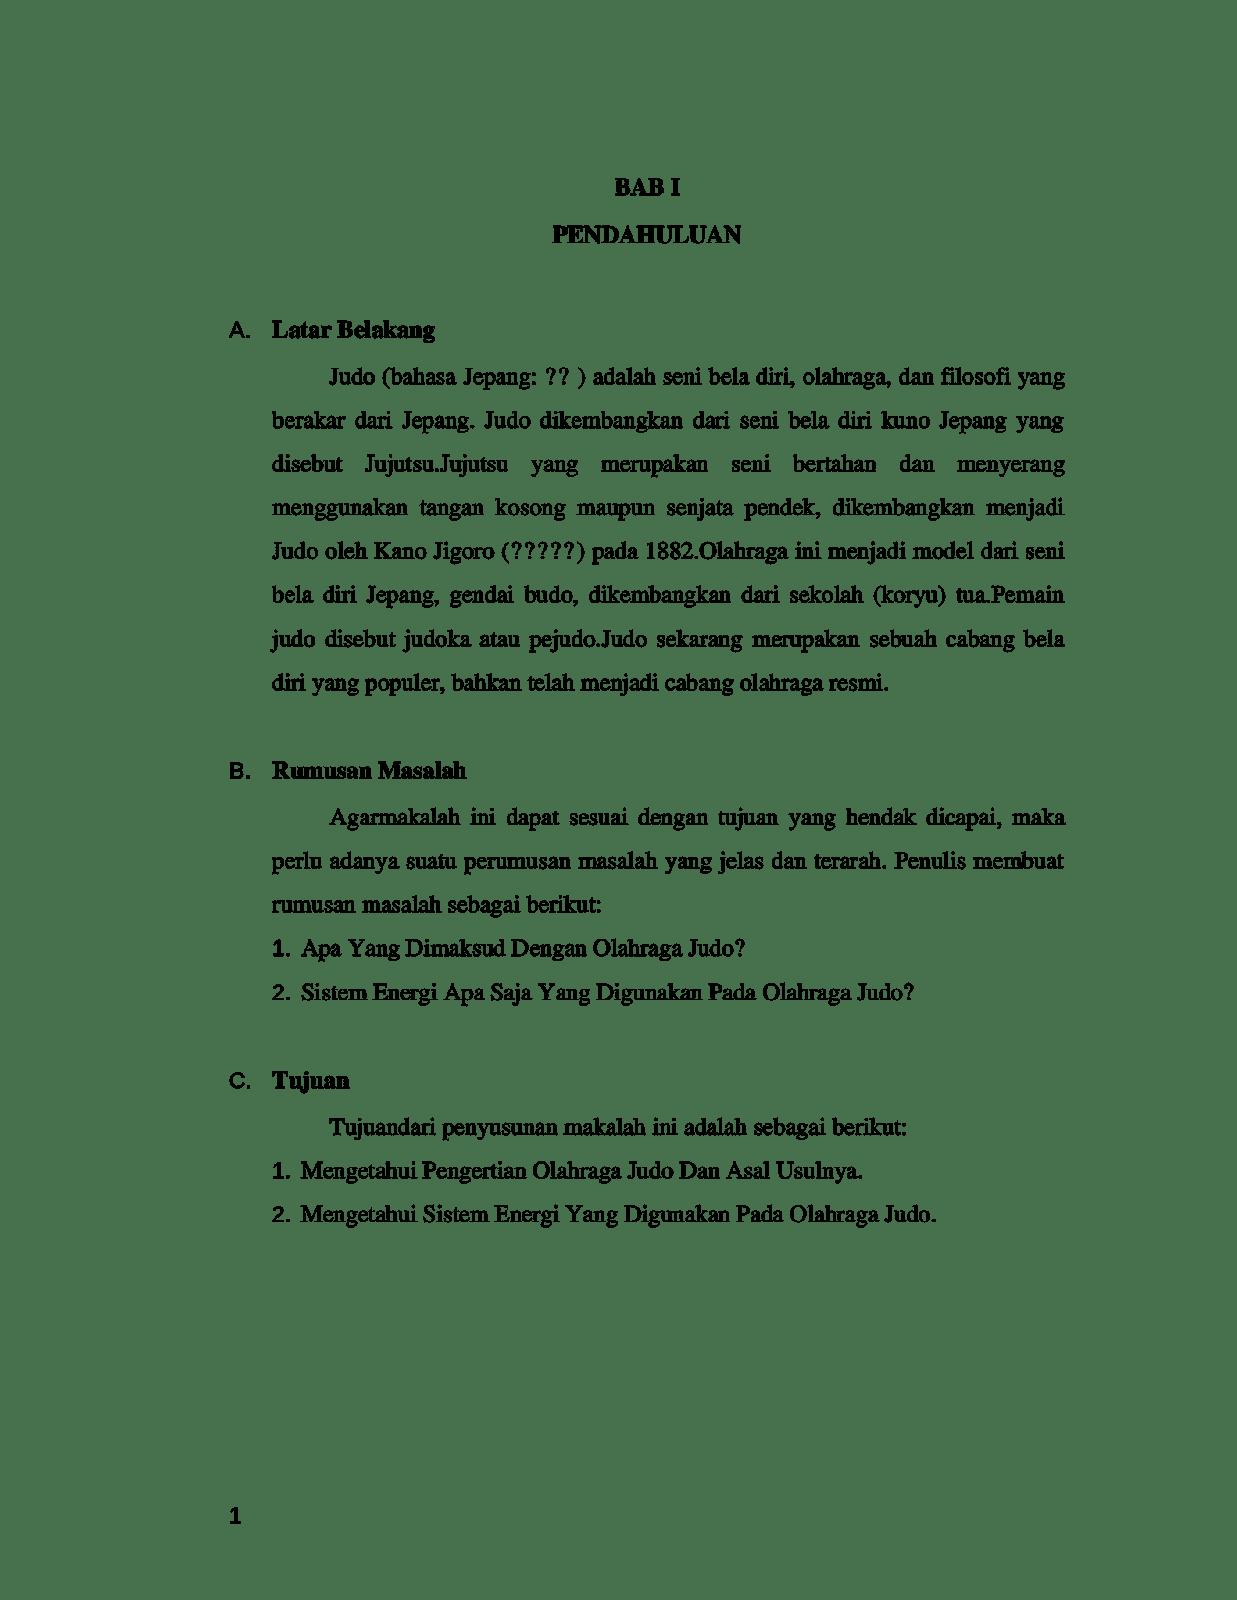 pengertian olahraga - wood scribd indo